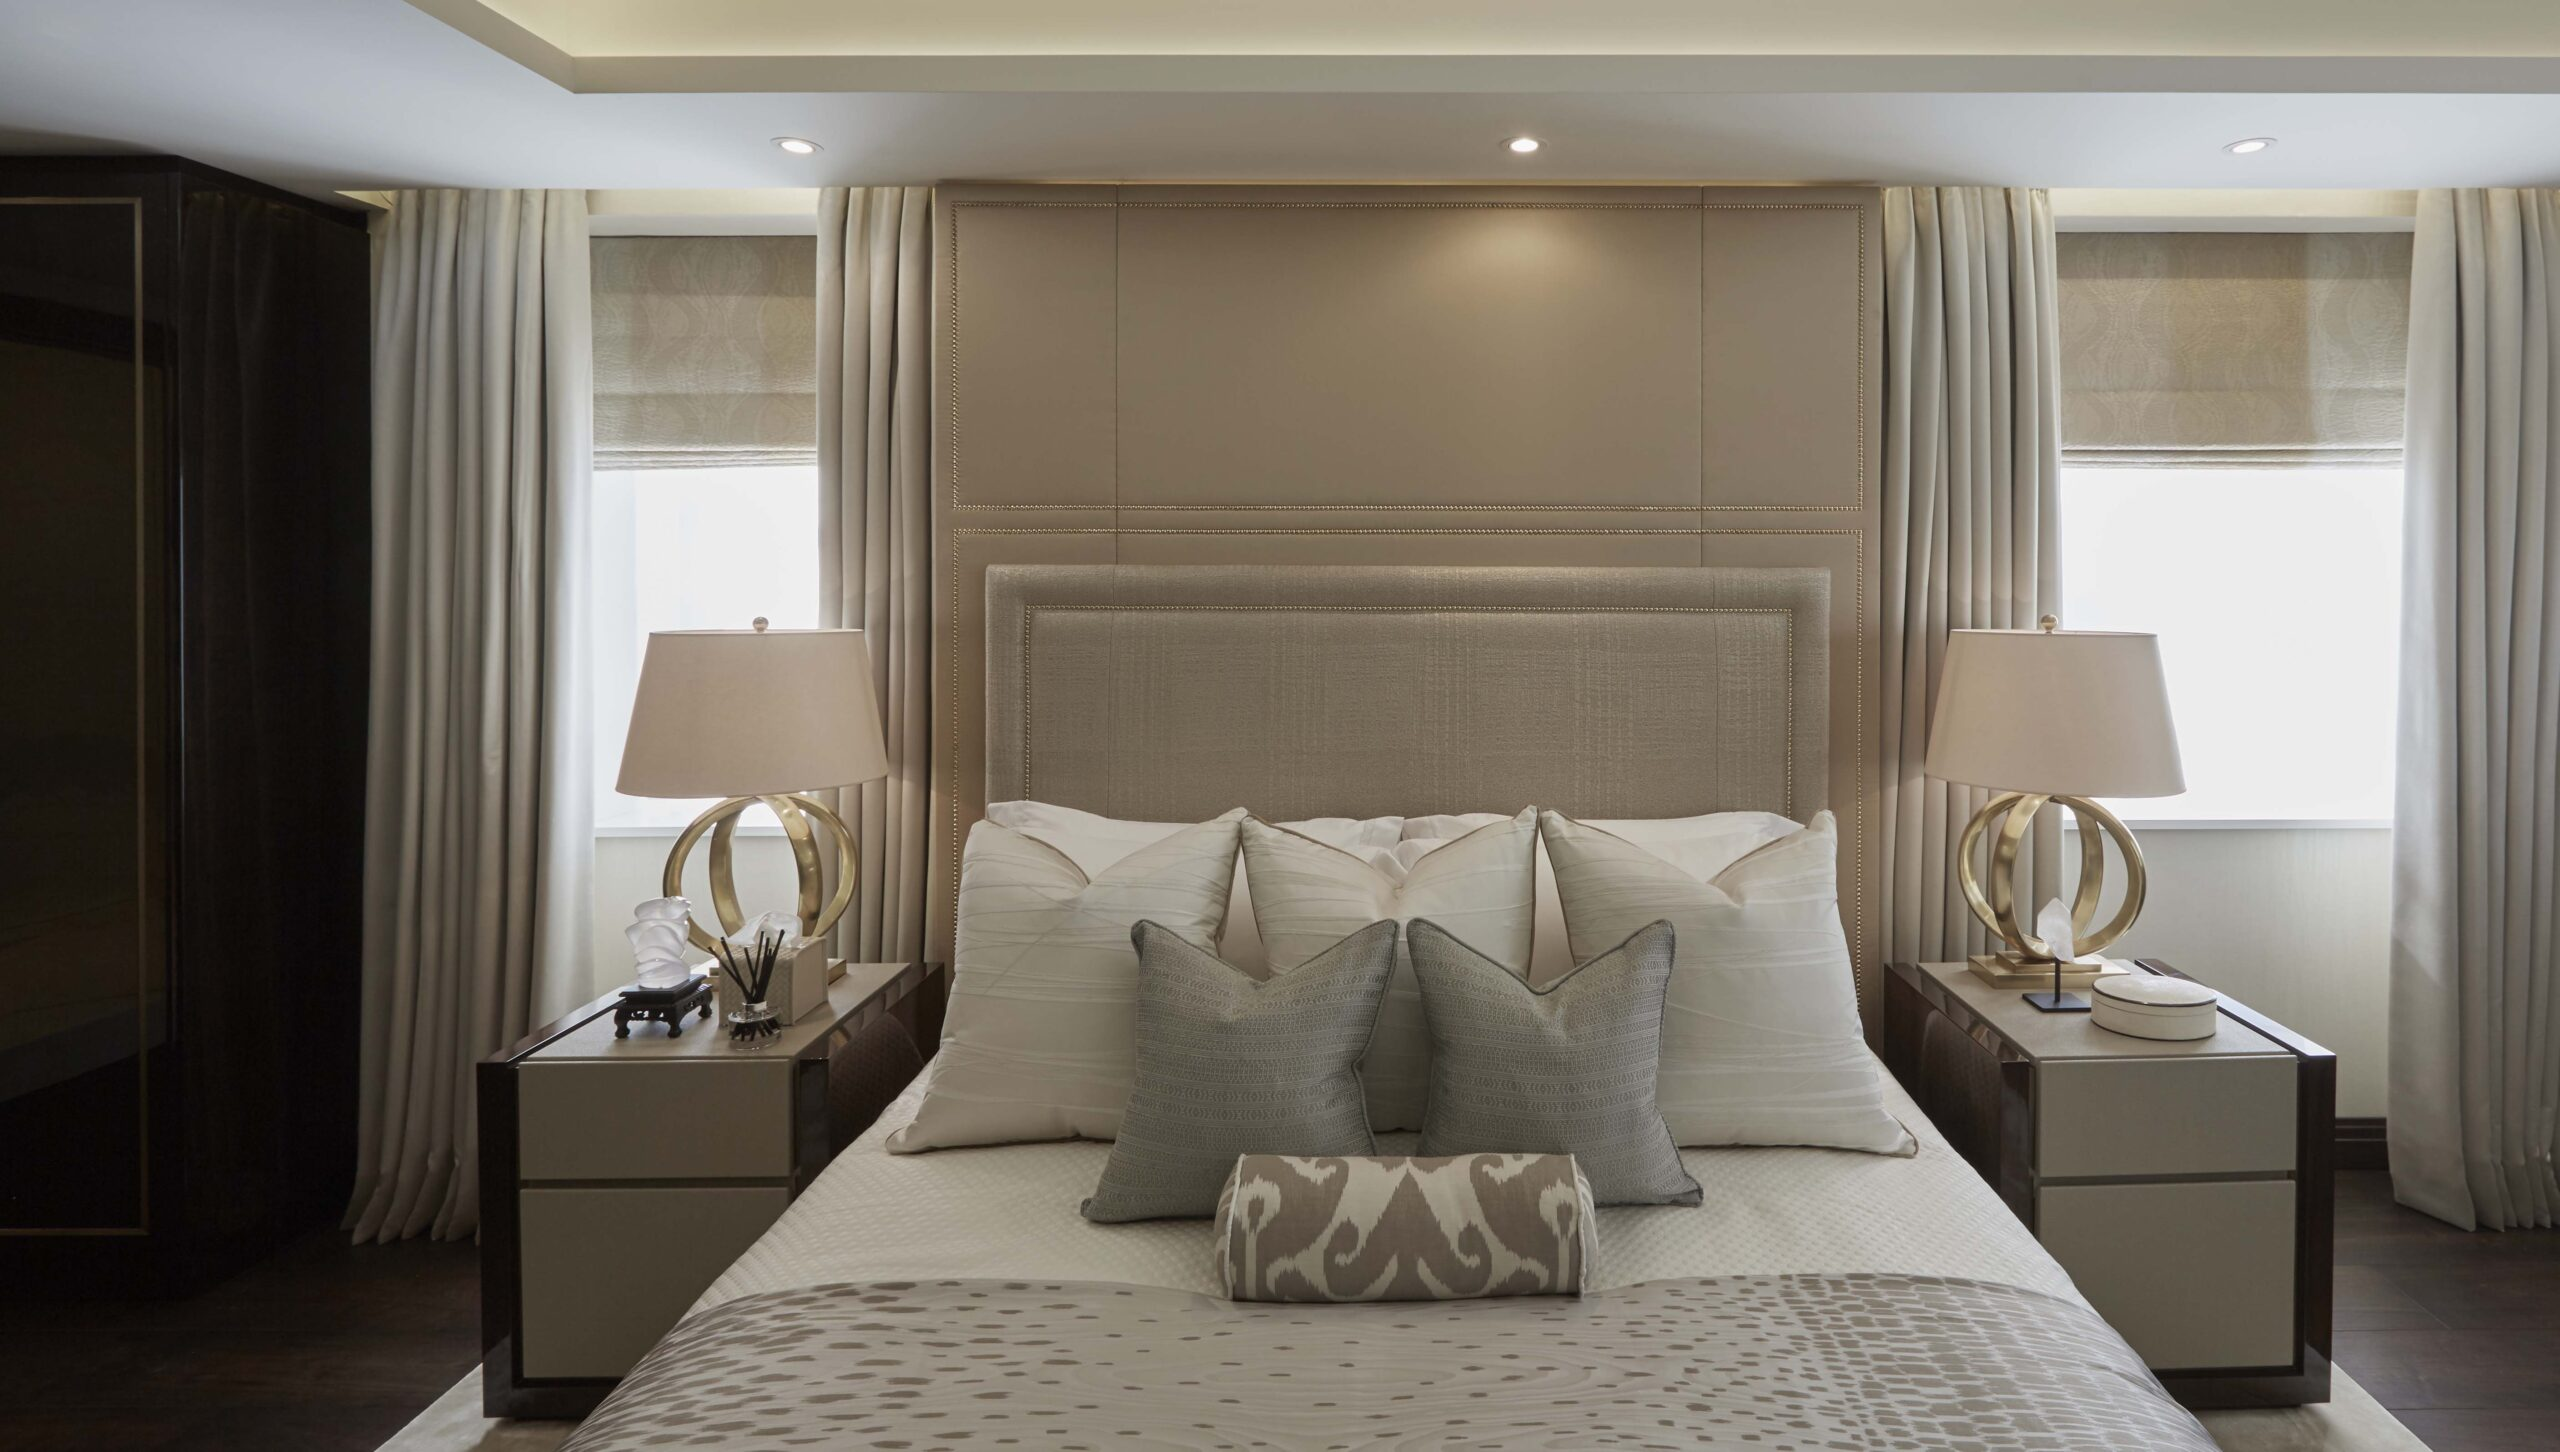 Bedroom in Hyde Park luxury interior design project